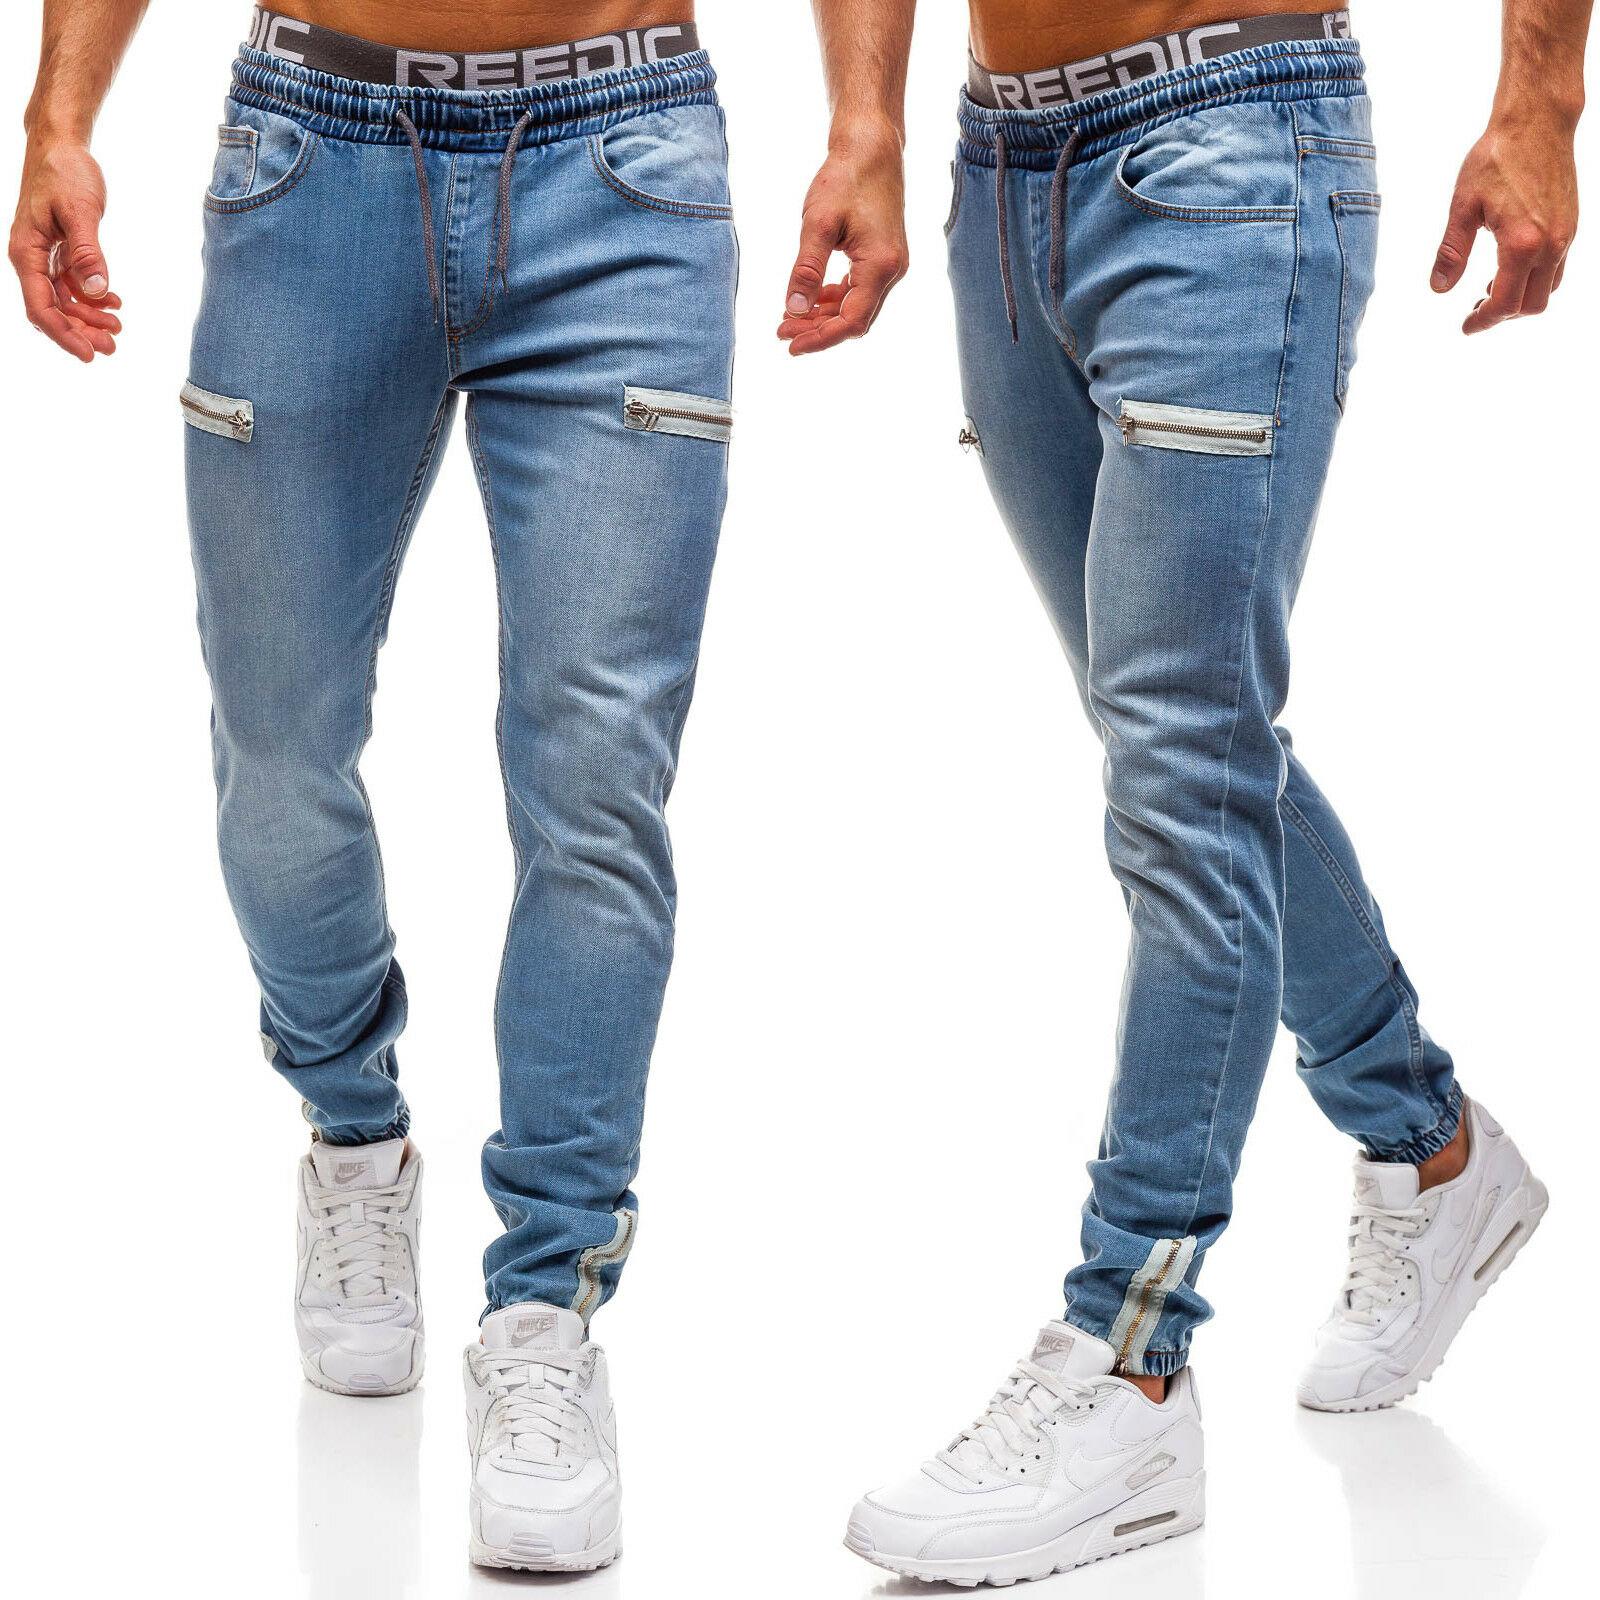 2019 European And American Men'S Denim Fabric Casual Frosted Zipper Design Sports Jeans Men